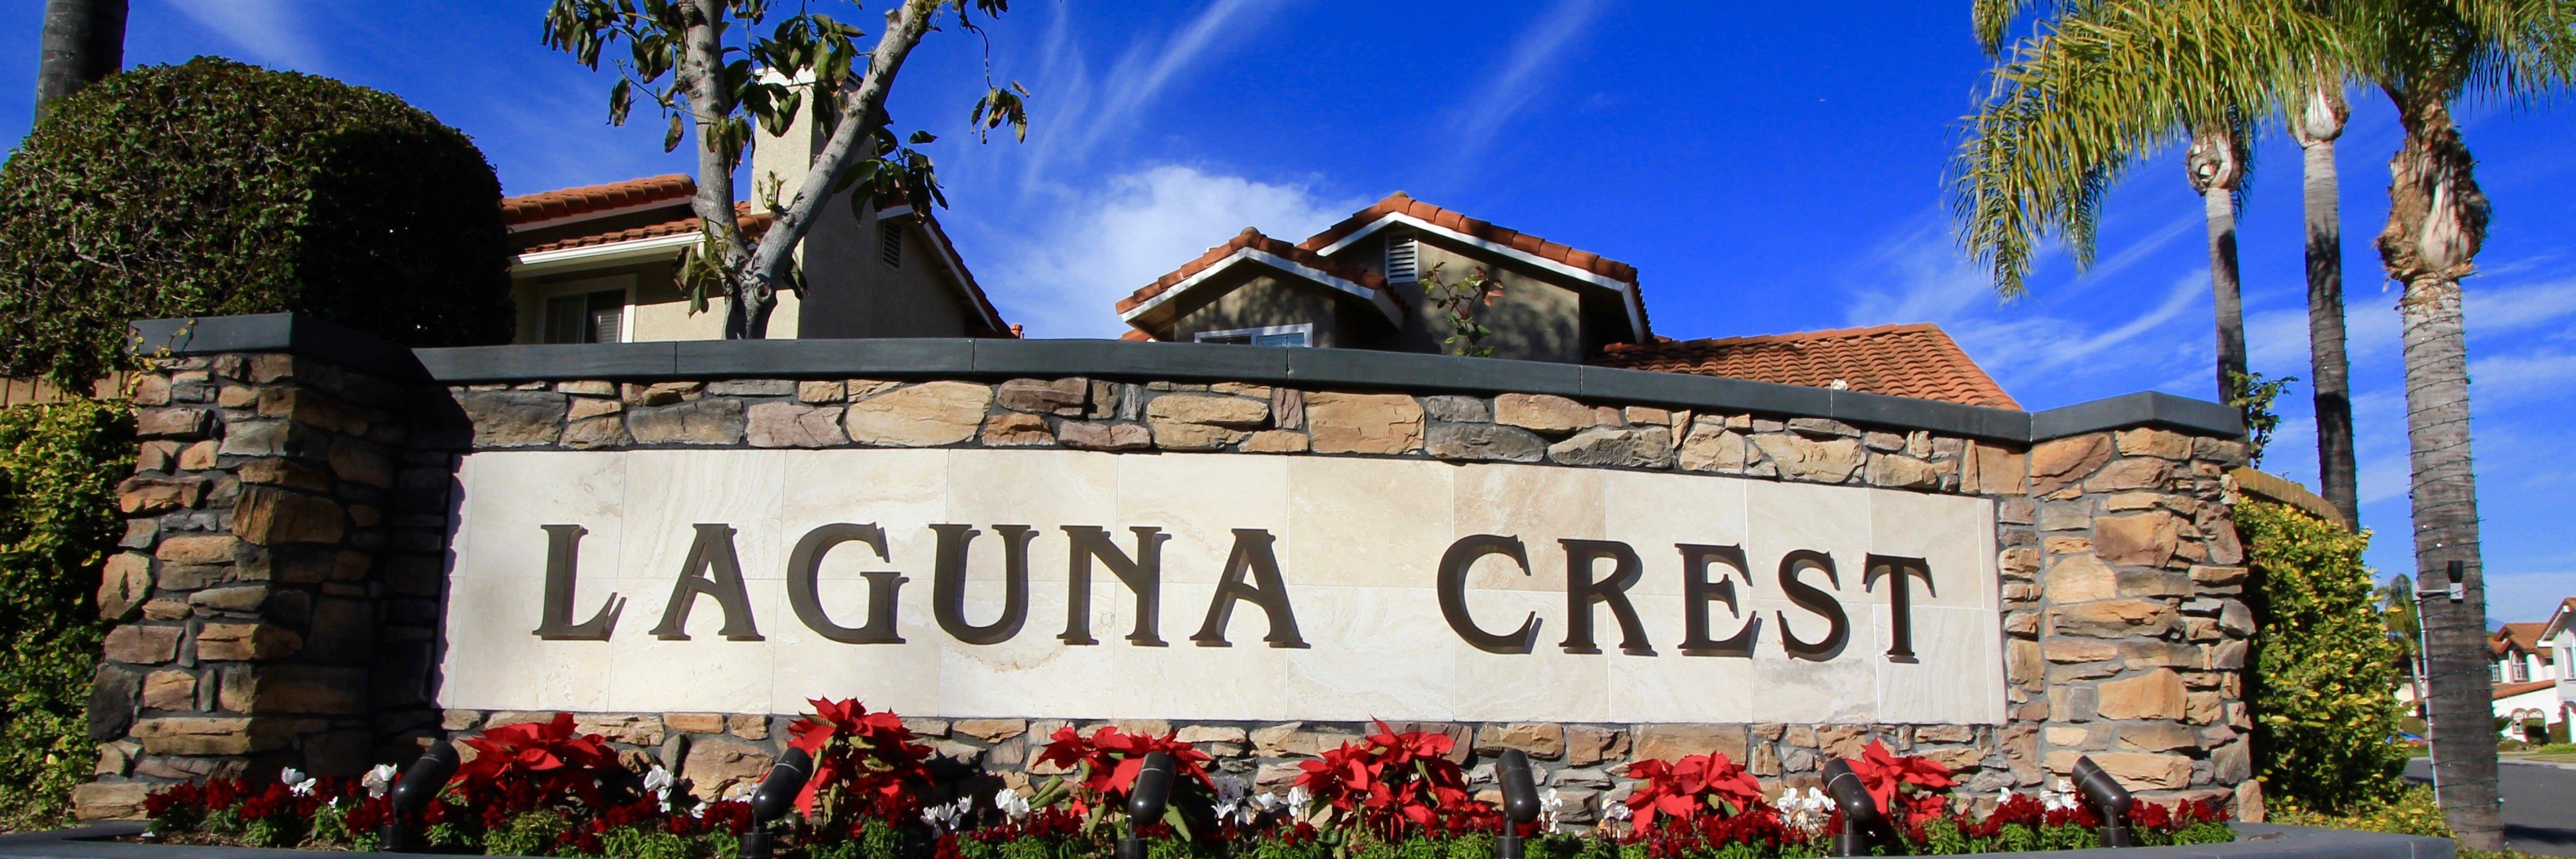 Laguna Crest is a neighborhood of homes located in Laguna Niguel California